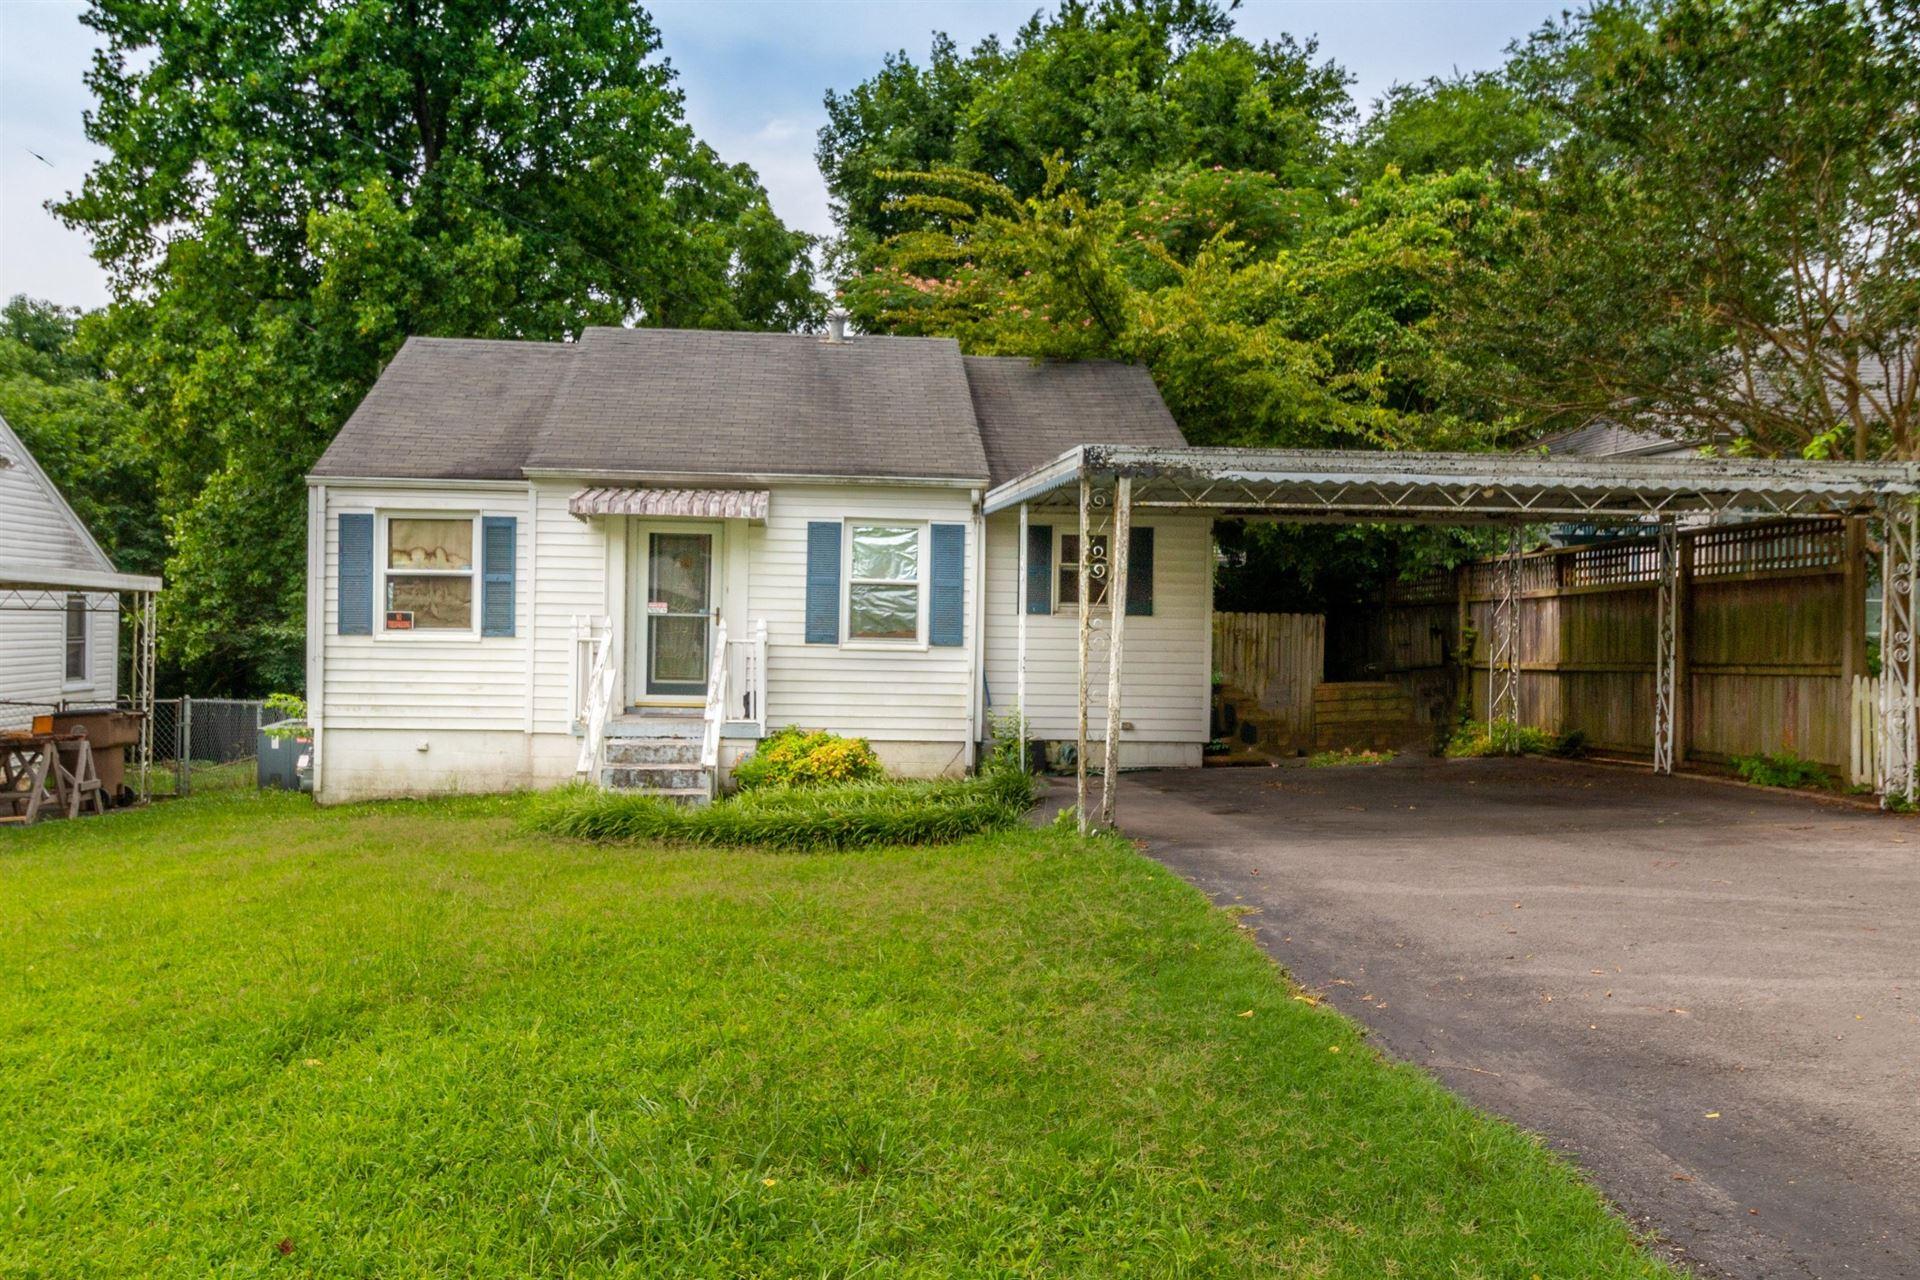 Photo of 1240 Kenmore Pl, Nashville, TN 37216 (MLS # 2168334)